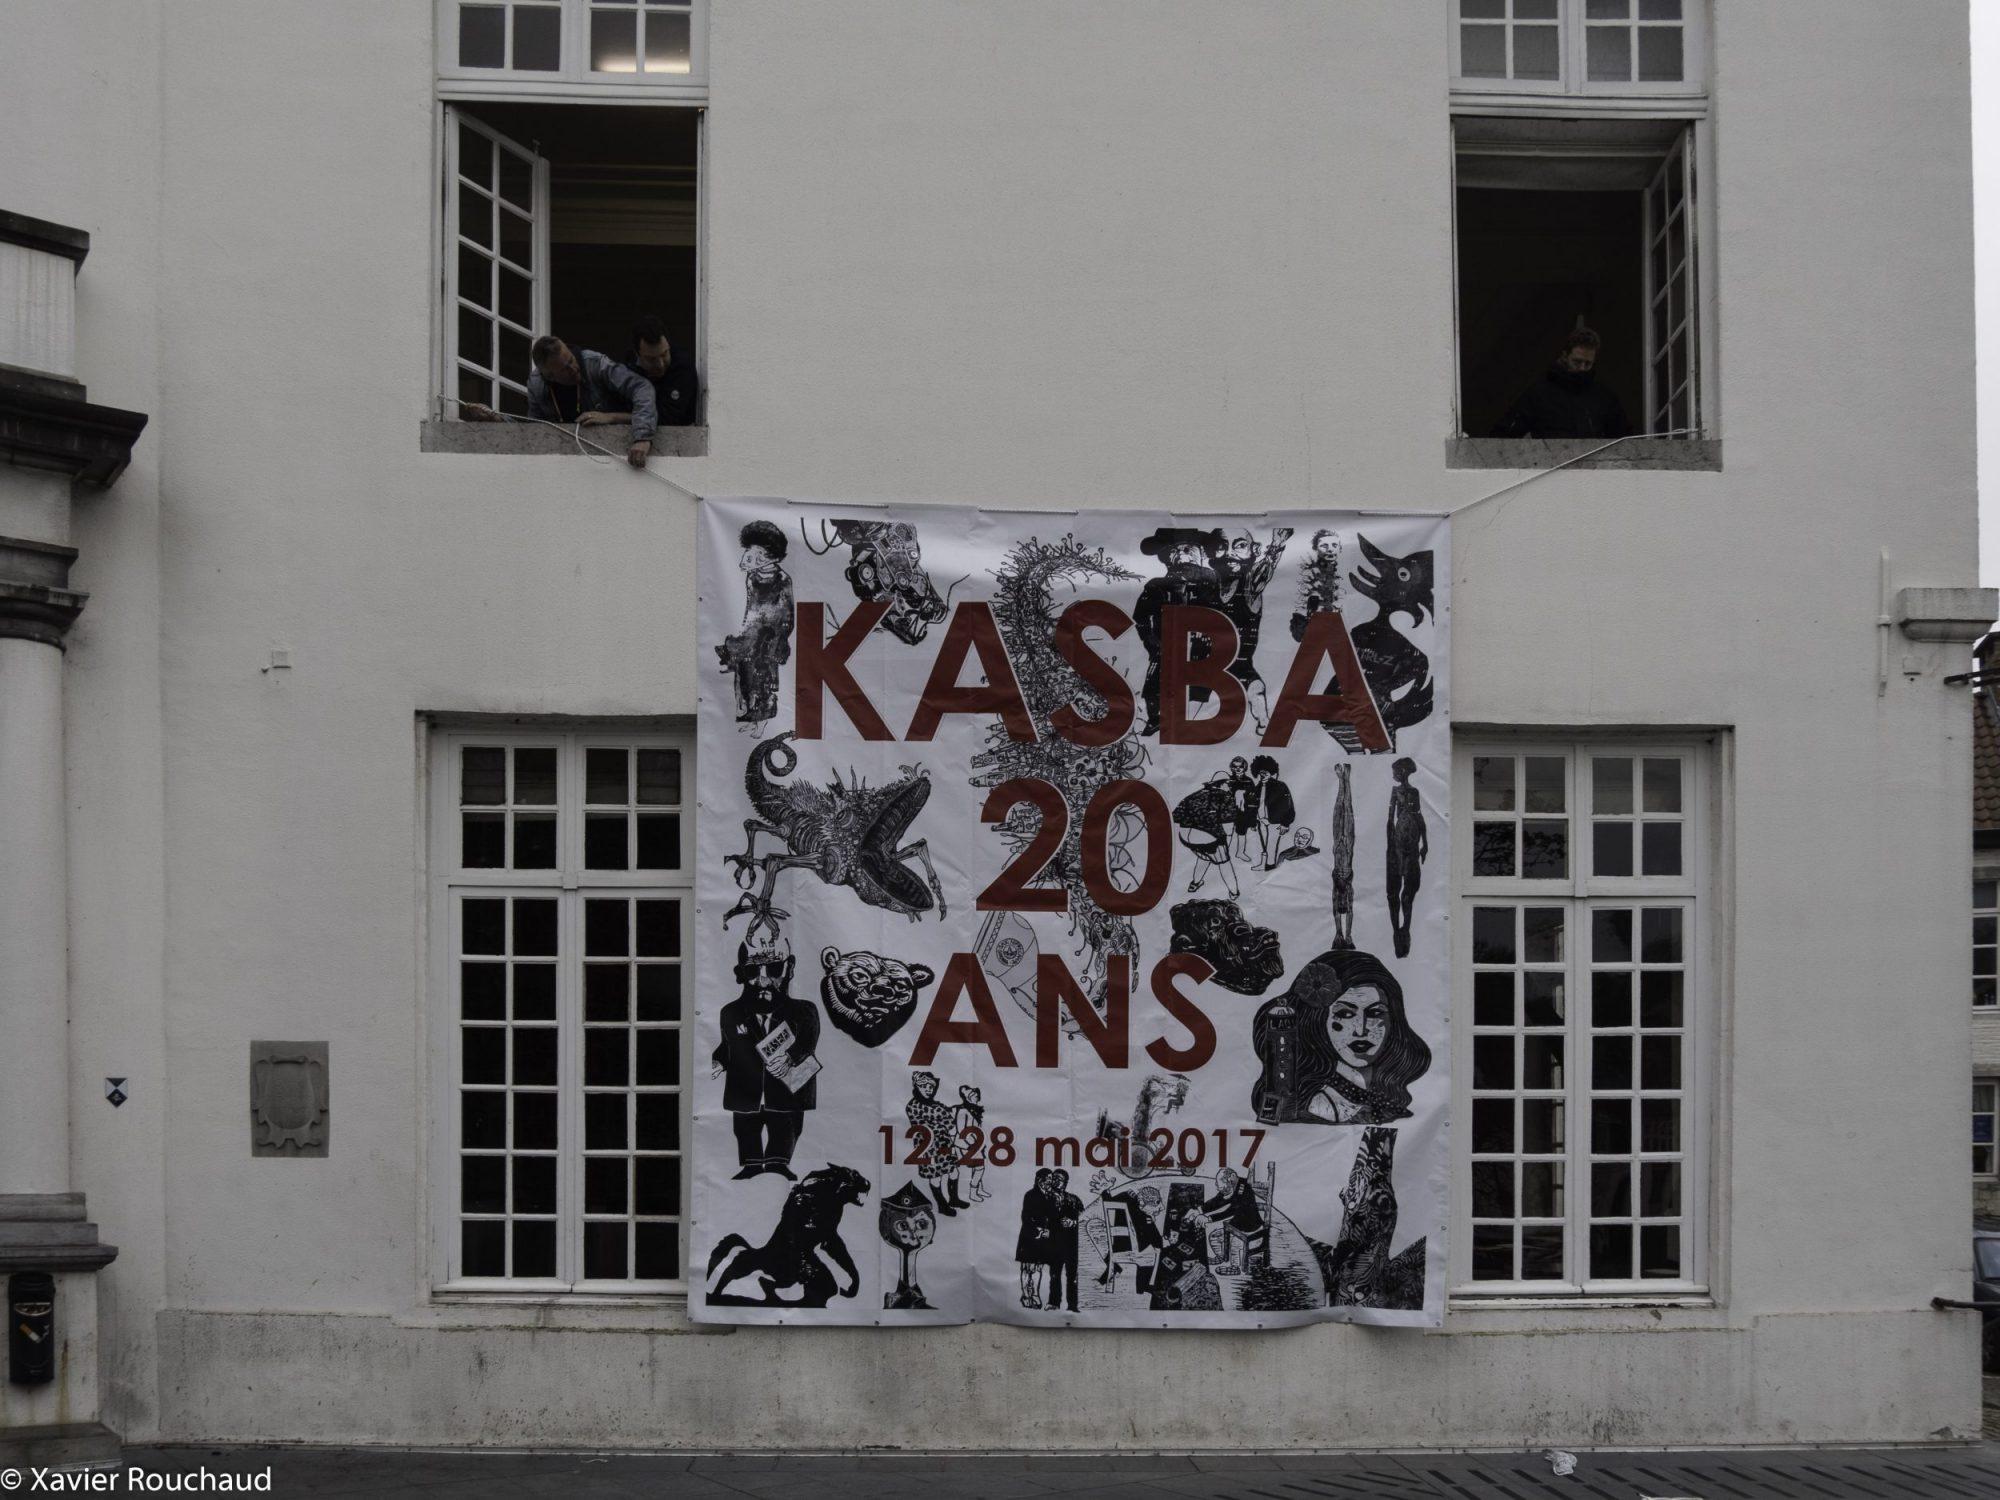 kasba 20 ans bache-1010633